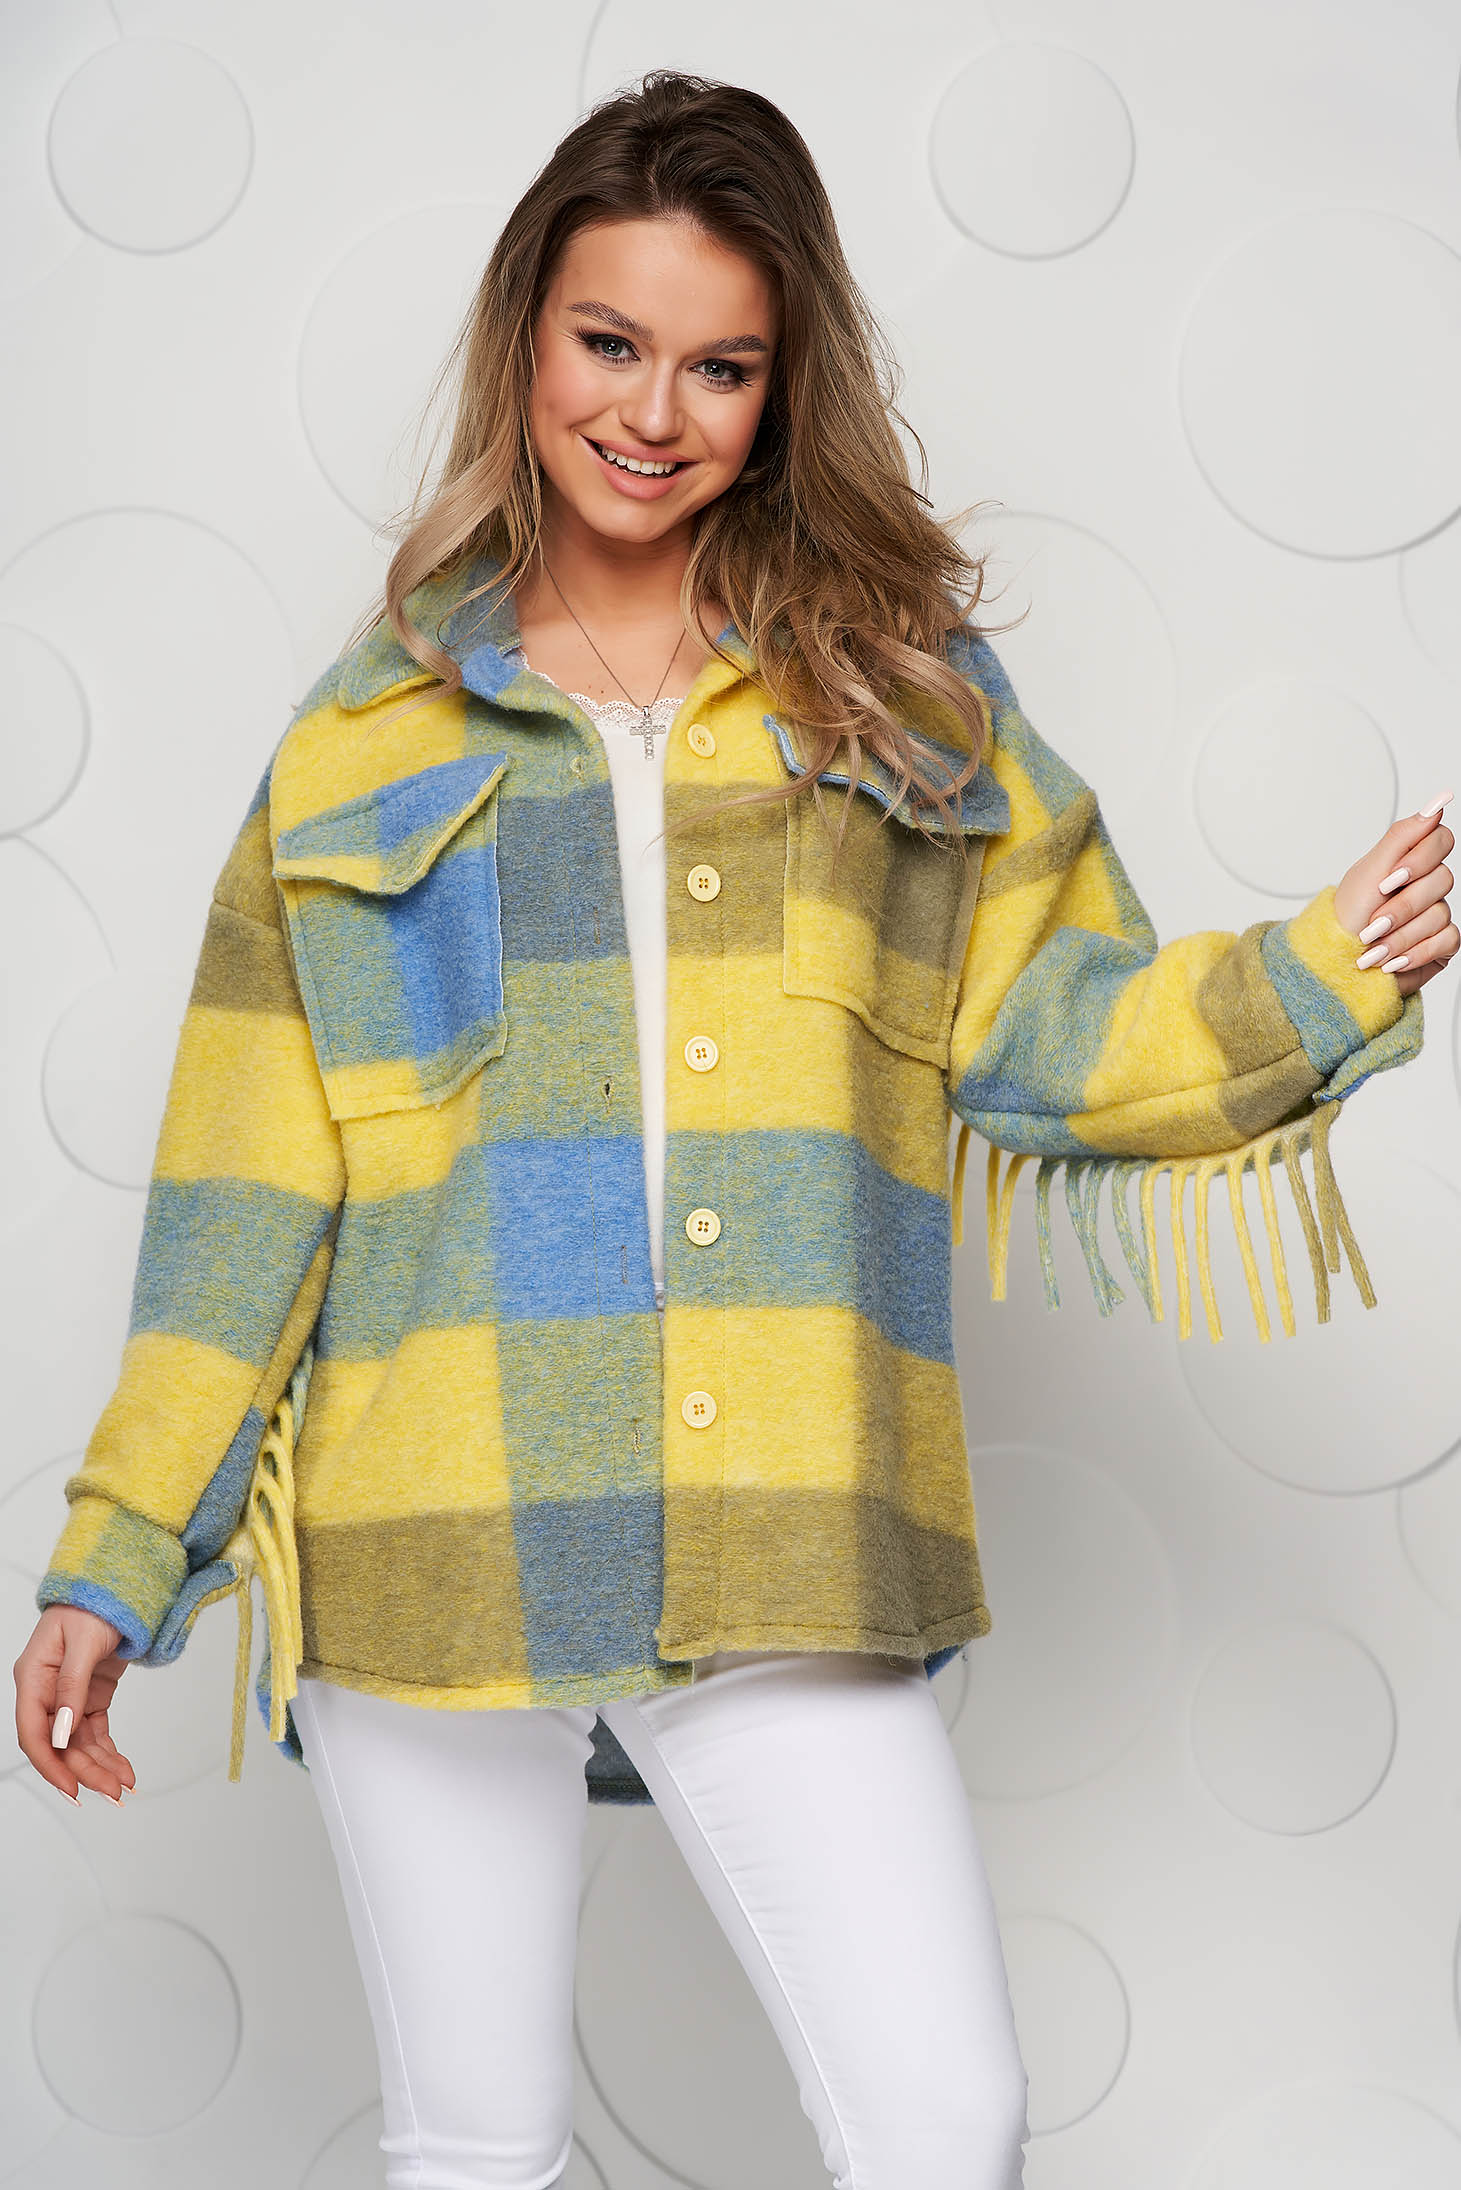 Jacheta tip camasa dama albastra in carouri din material pufos cu croi larg cu franjuri